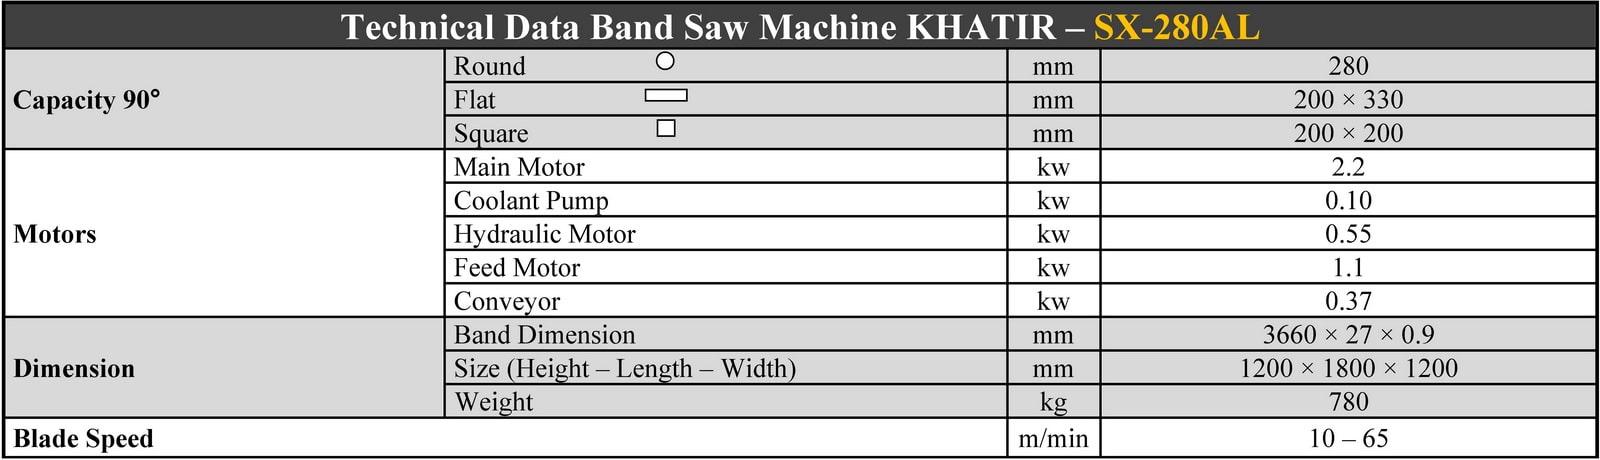 SX 280AL - مشخصات فنی دستگاه اره نواری بازویی تمام اتوماتیک خطیر